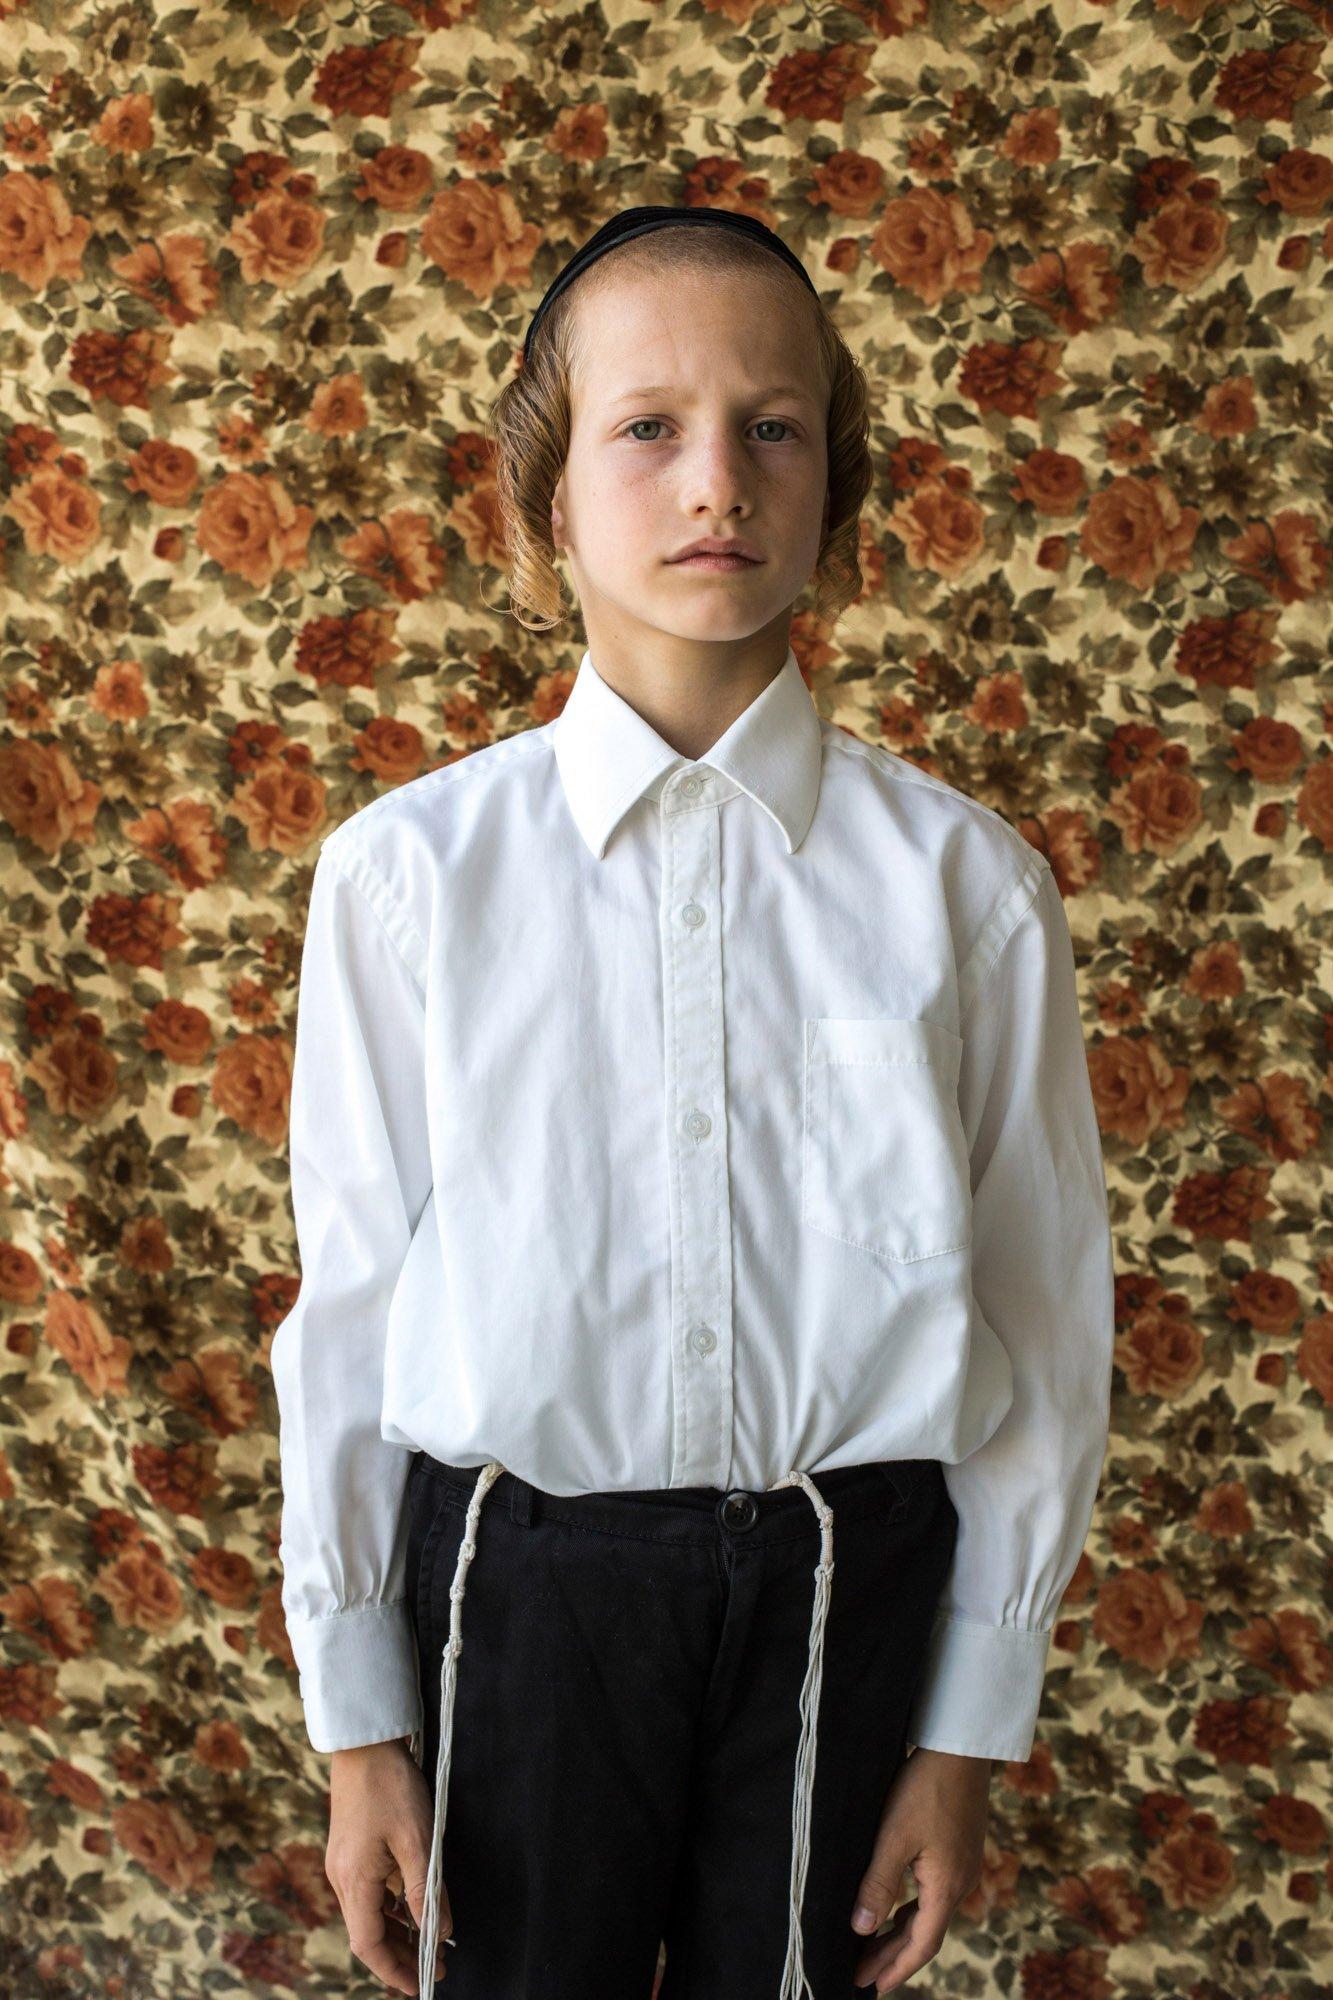 Portrait photograph of a young boy by Kovi Konowiecki